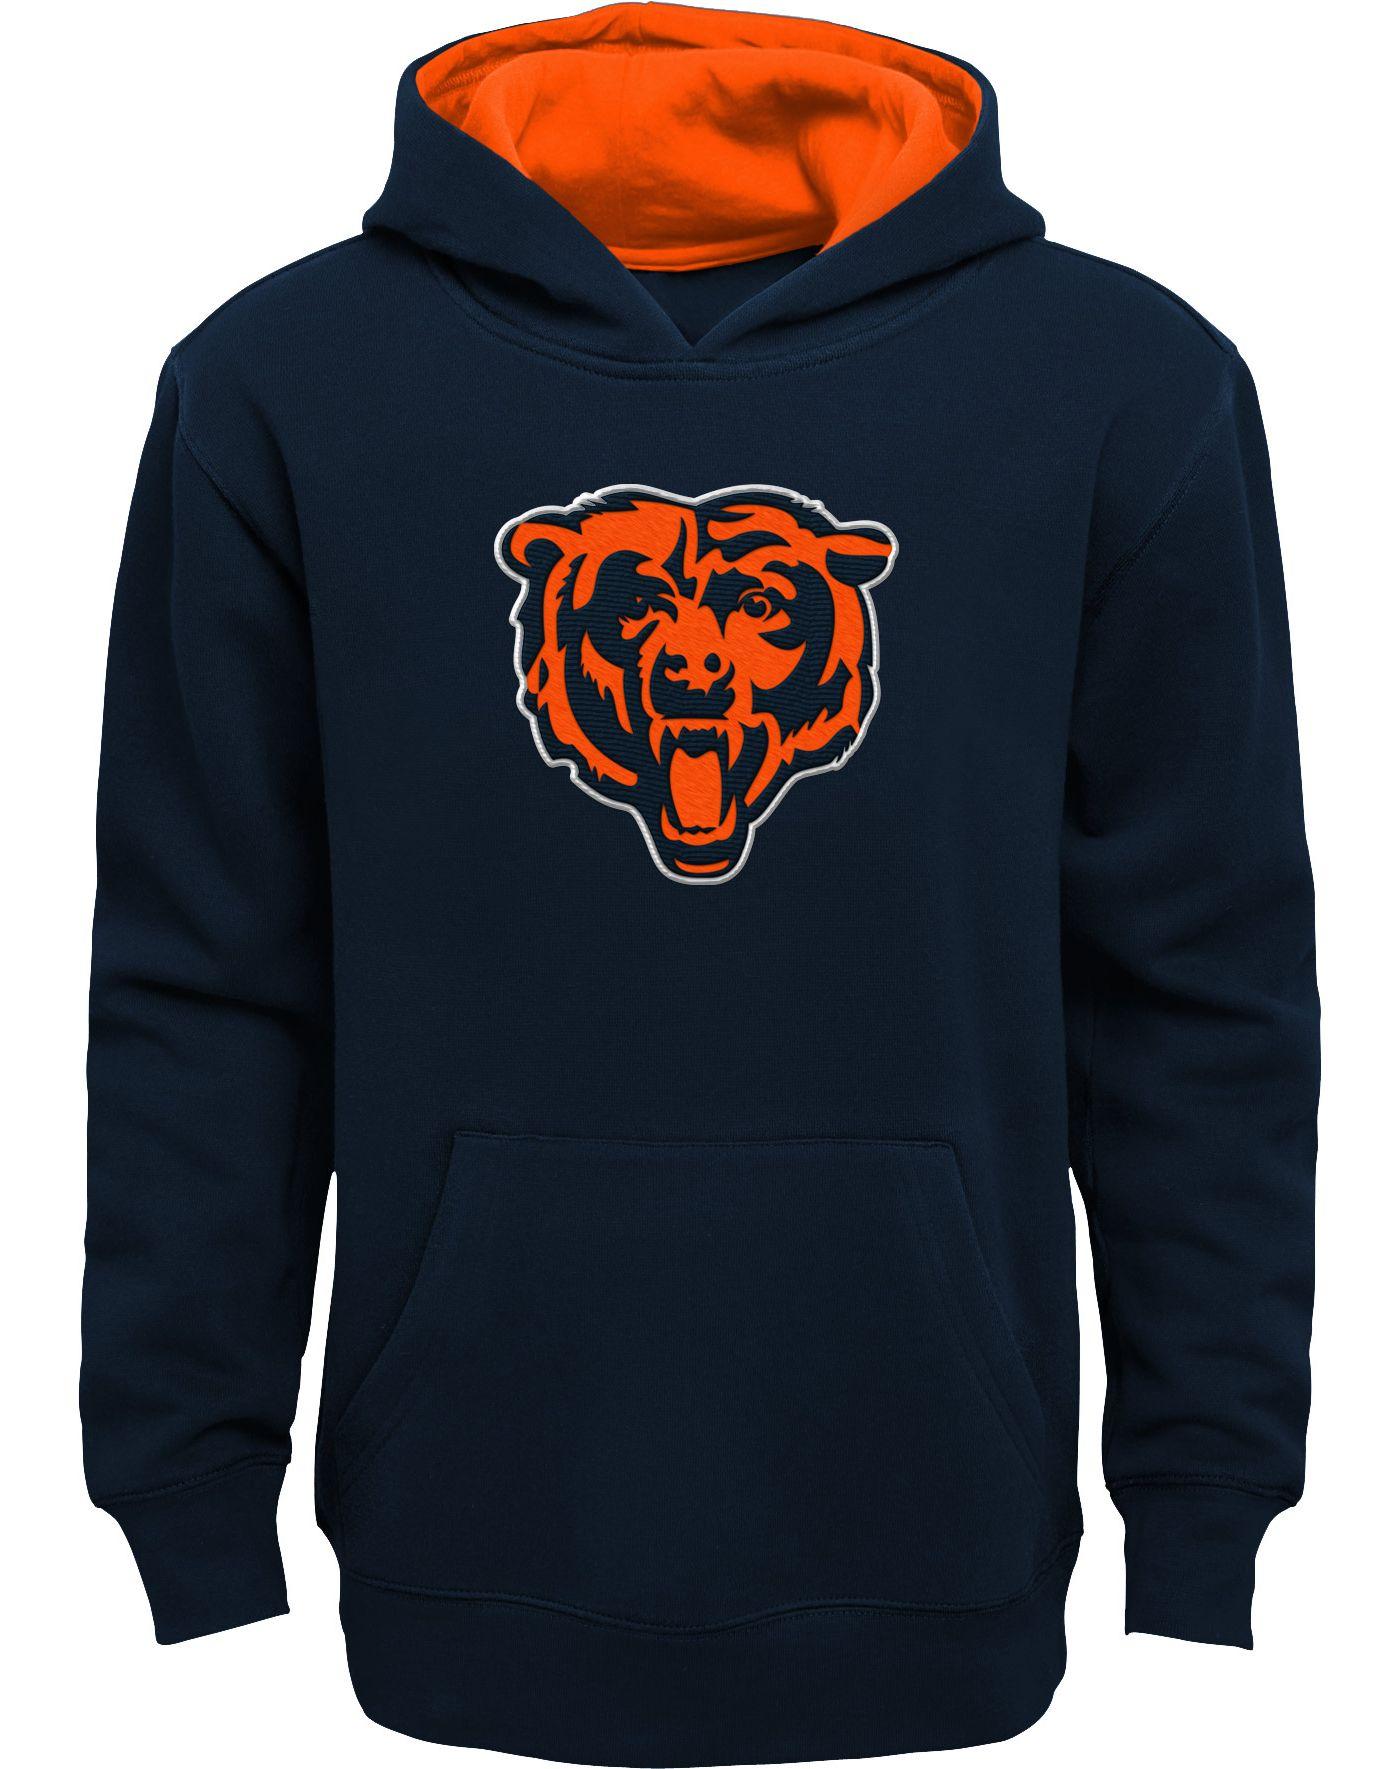 NFL Team Apparel Boys' Chicago Bears Prime Navy Pullover Hoodie